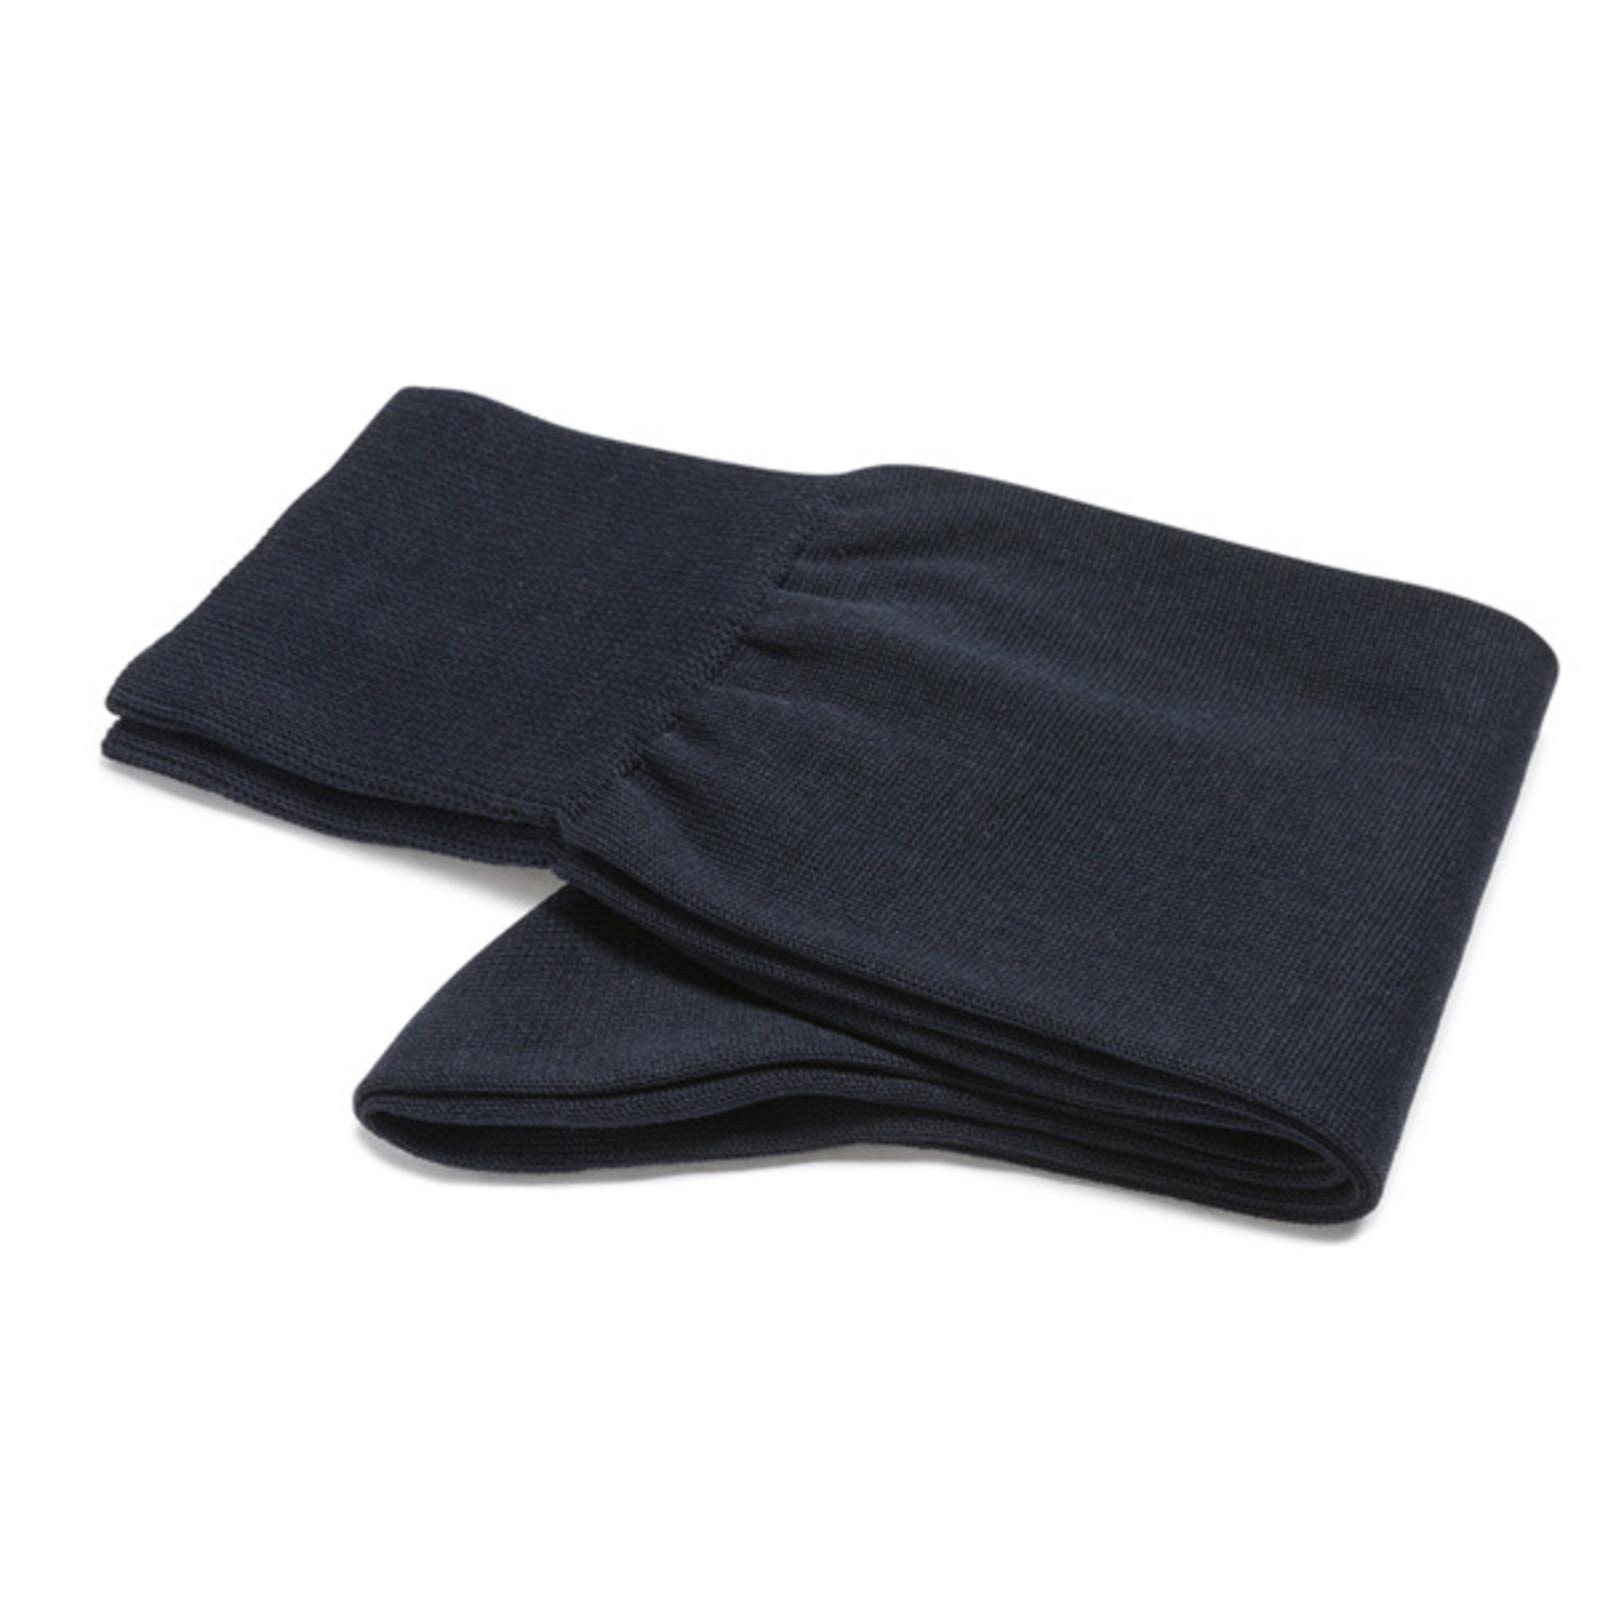 Carlo Lanza dunkelblaue Socken Baumwolle